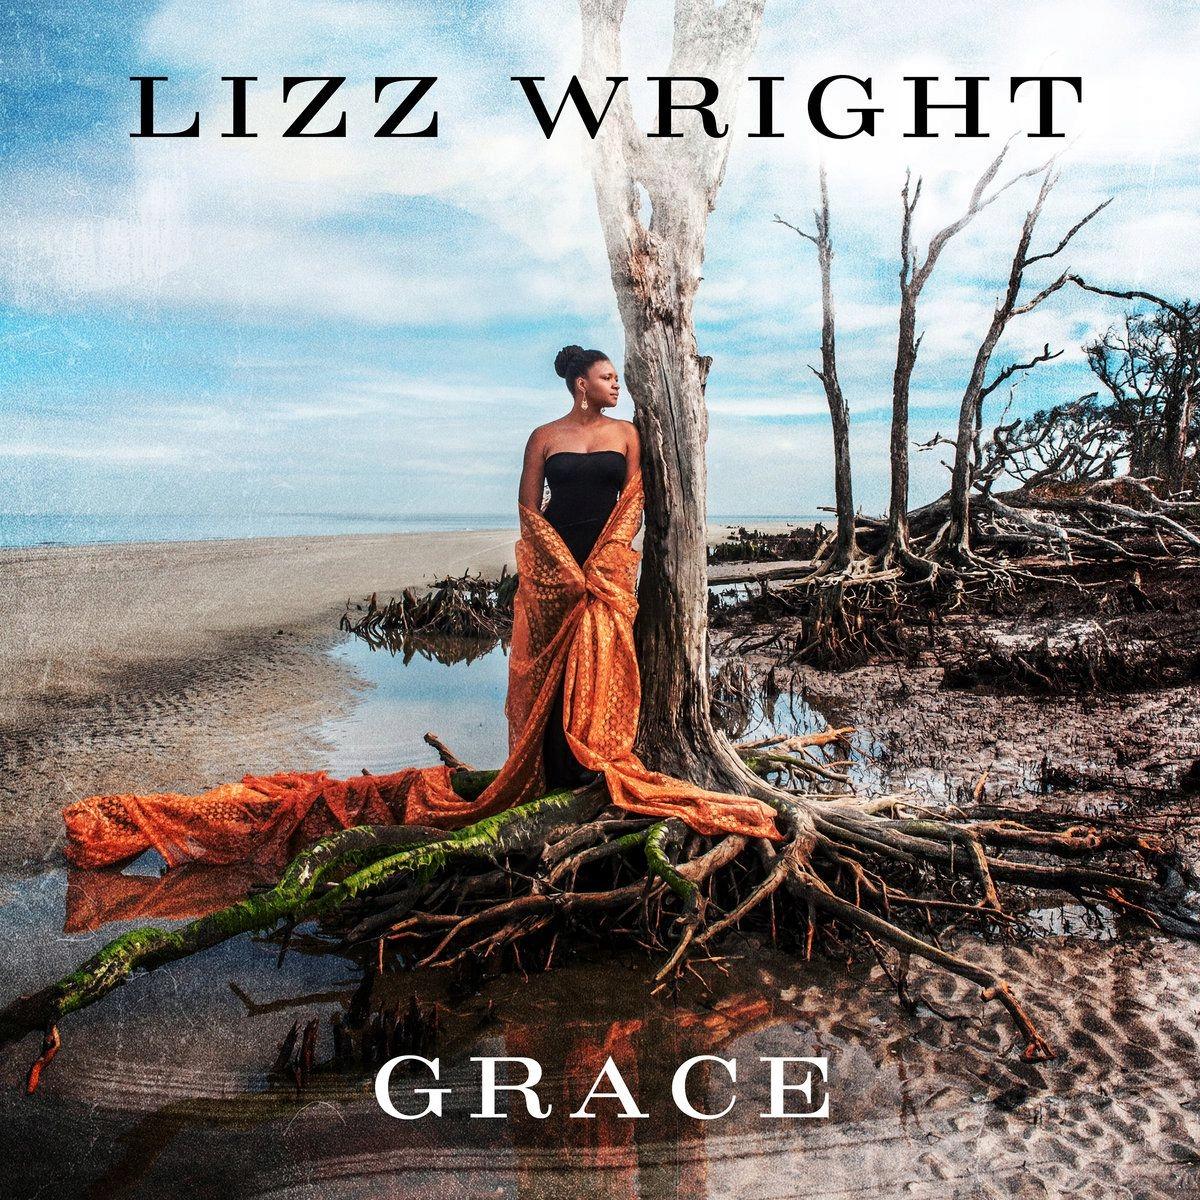 Wright Lizz – Grace